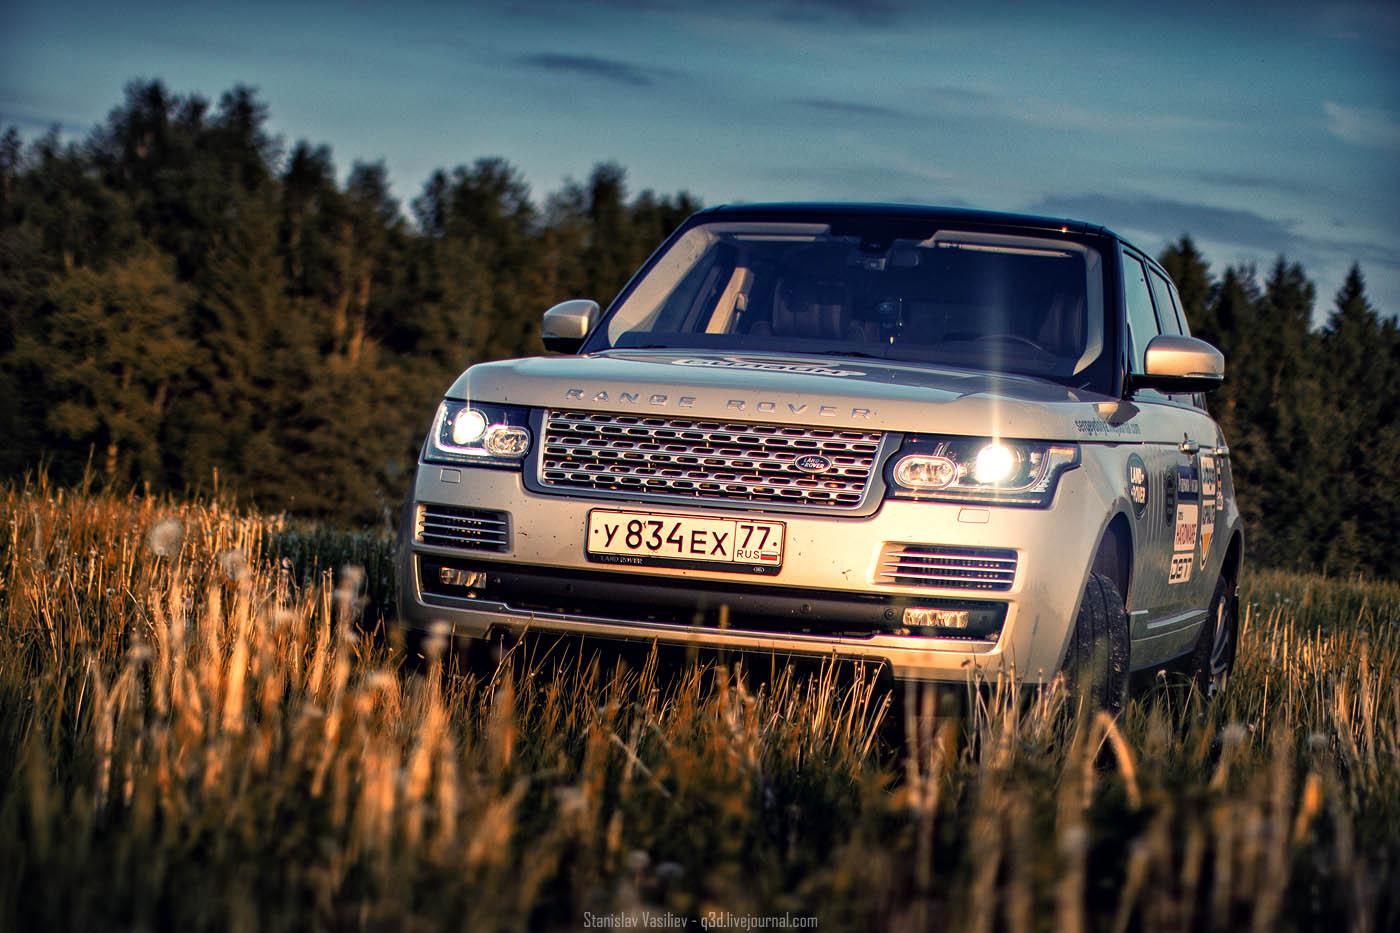 Range Rover Vogue SE 2012 4.4